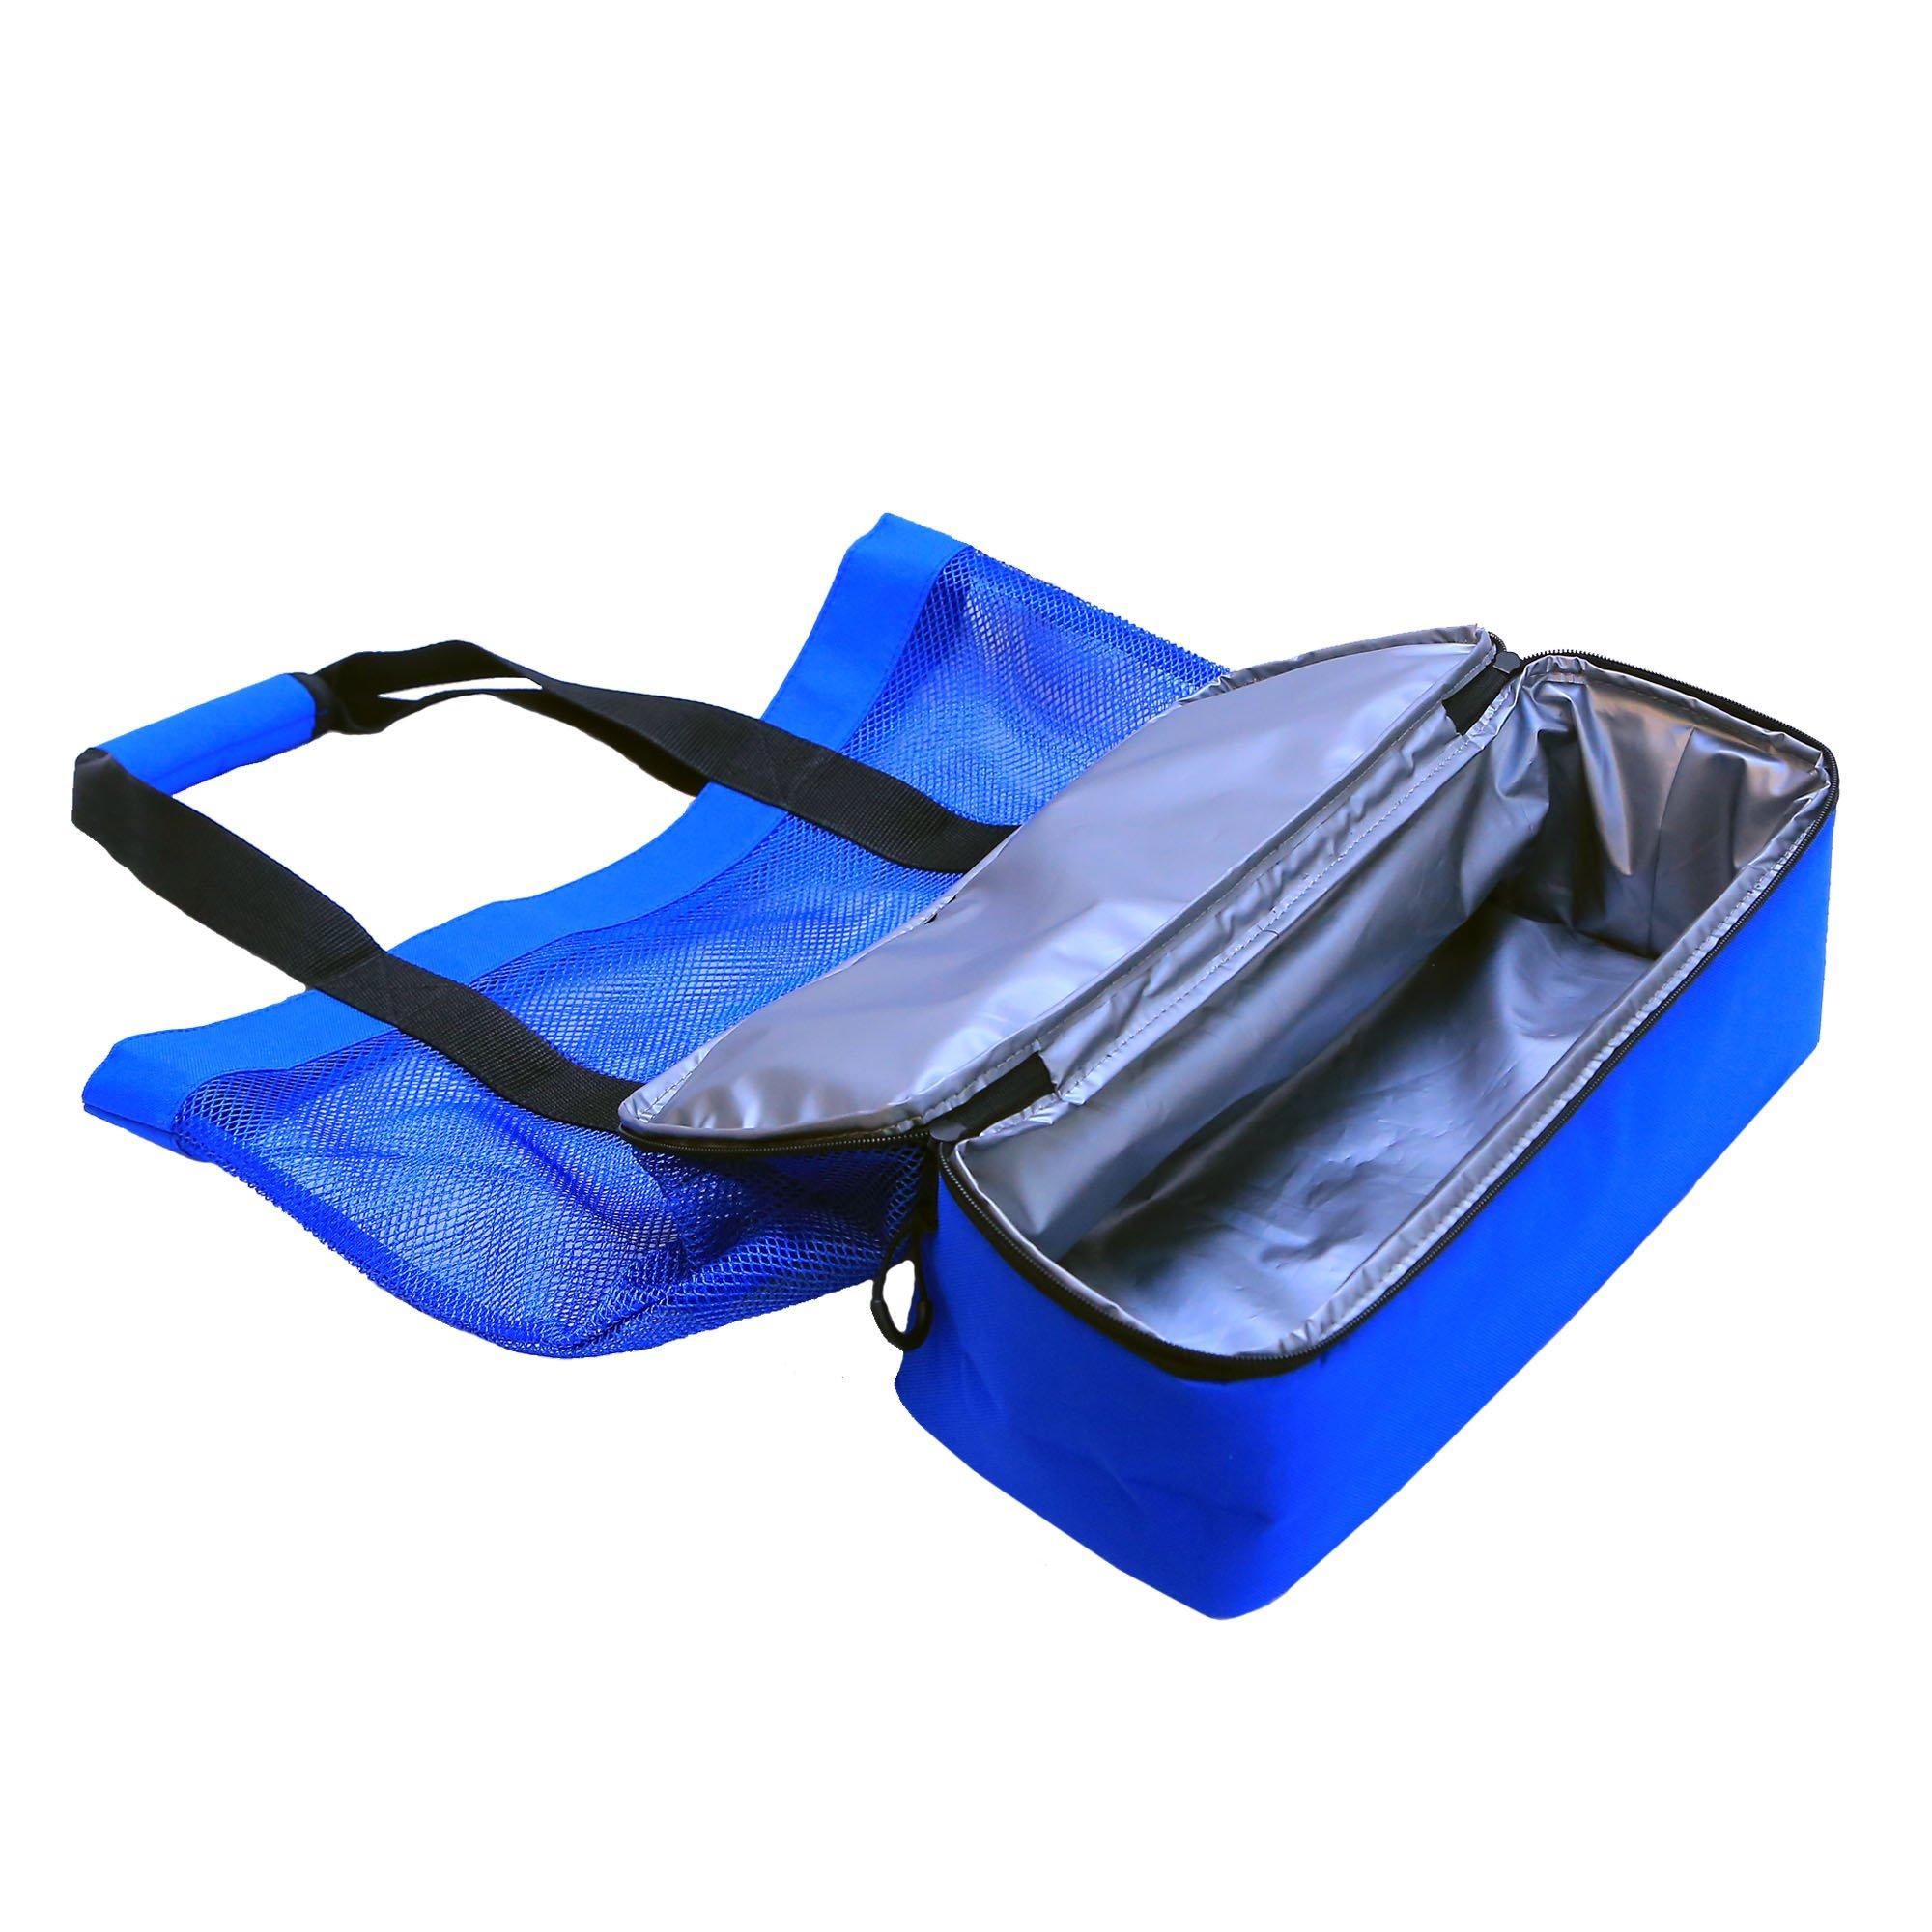 JU&JI's Beach Tote Bags – 2-in-1 Design – Mesh Bag & Built-in Picnic Cooler Compartment – Big or Extra Large Cooler Beach Bags – Padded Handle, Waterproof Zipper & Heavy-Duty Build by Ju&Ji (Image #7)